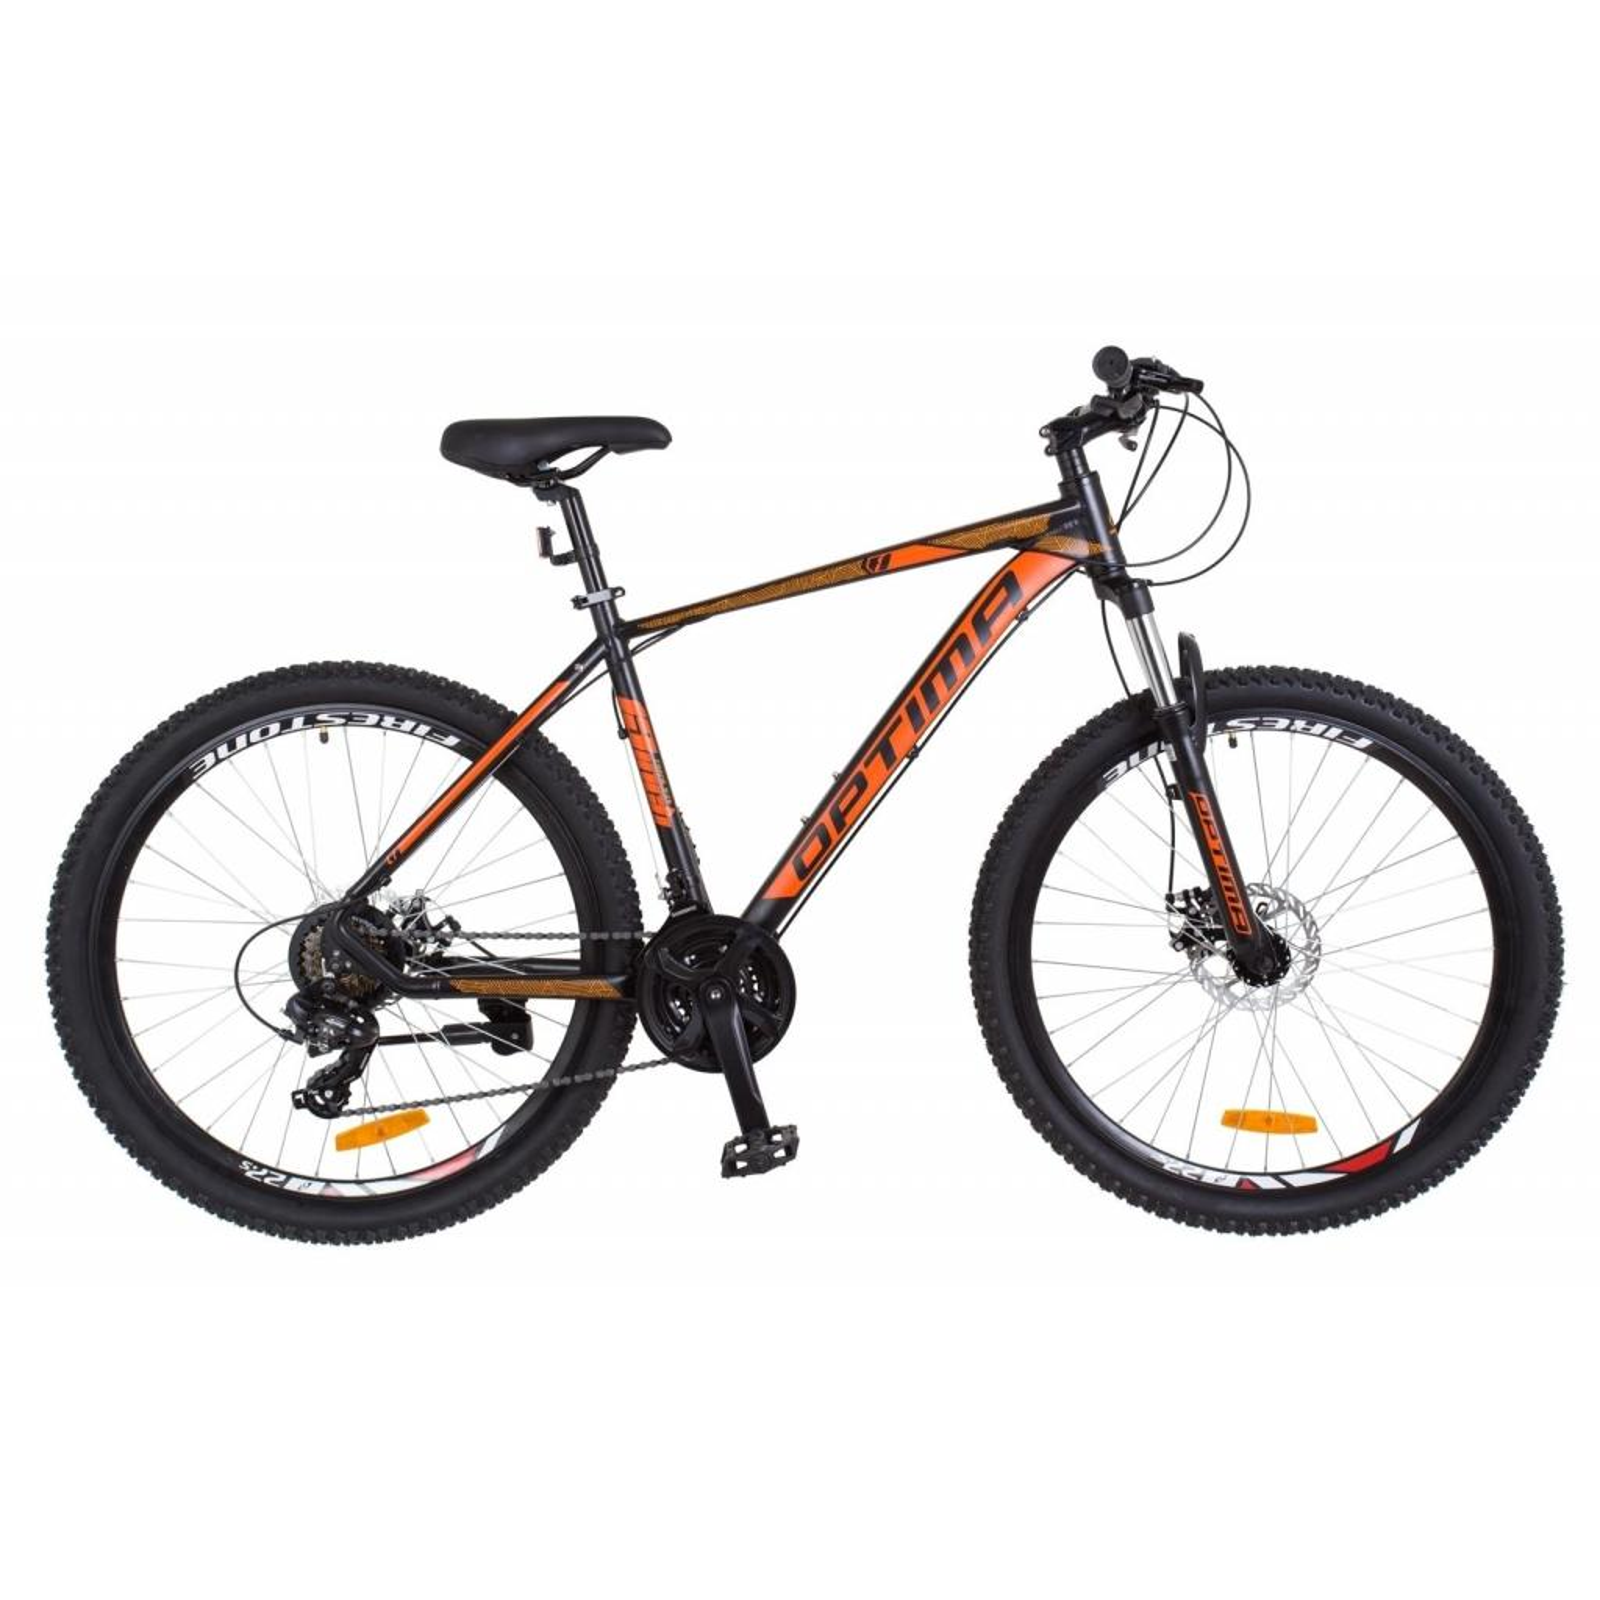 "Велосипед Optimabikes 26"" F-1 2018 AM 14G DD рама-17"" Al черно-оранжевый (OPS-OP-26-125)"